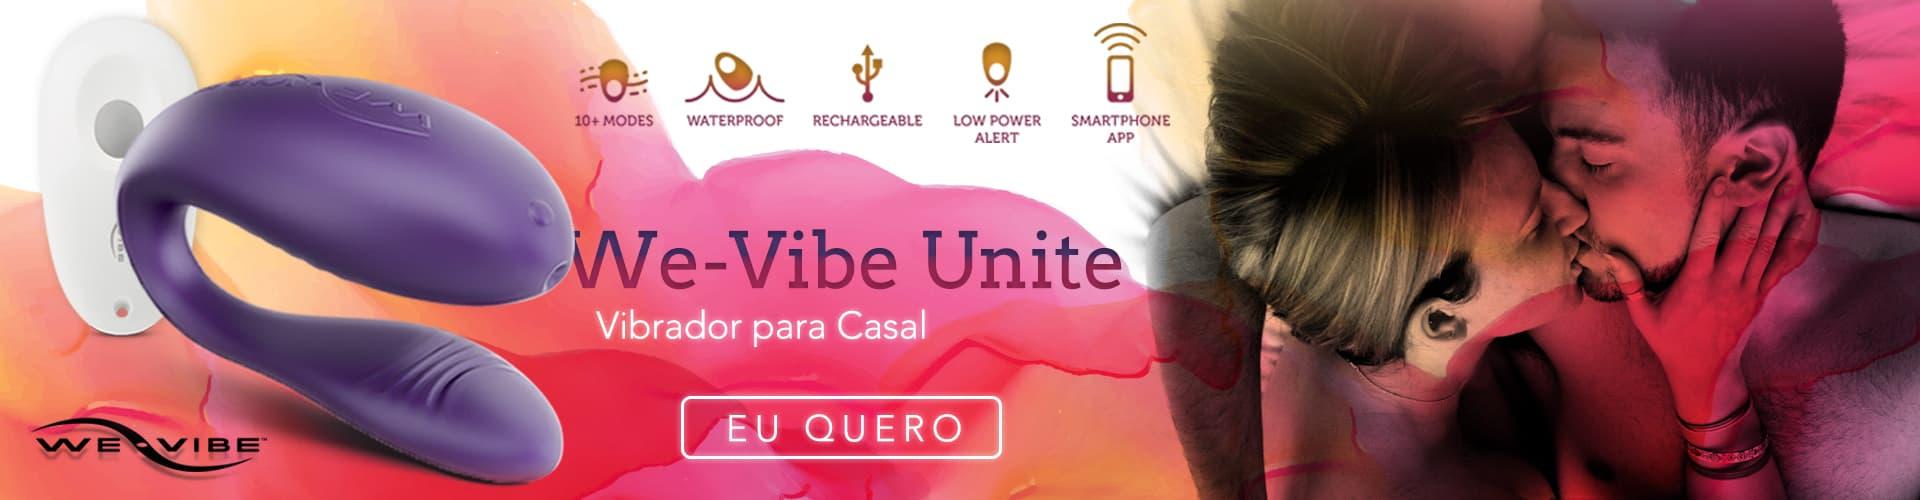 we-vibe-unite